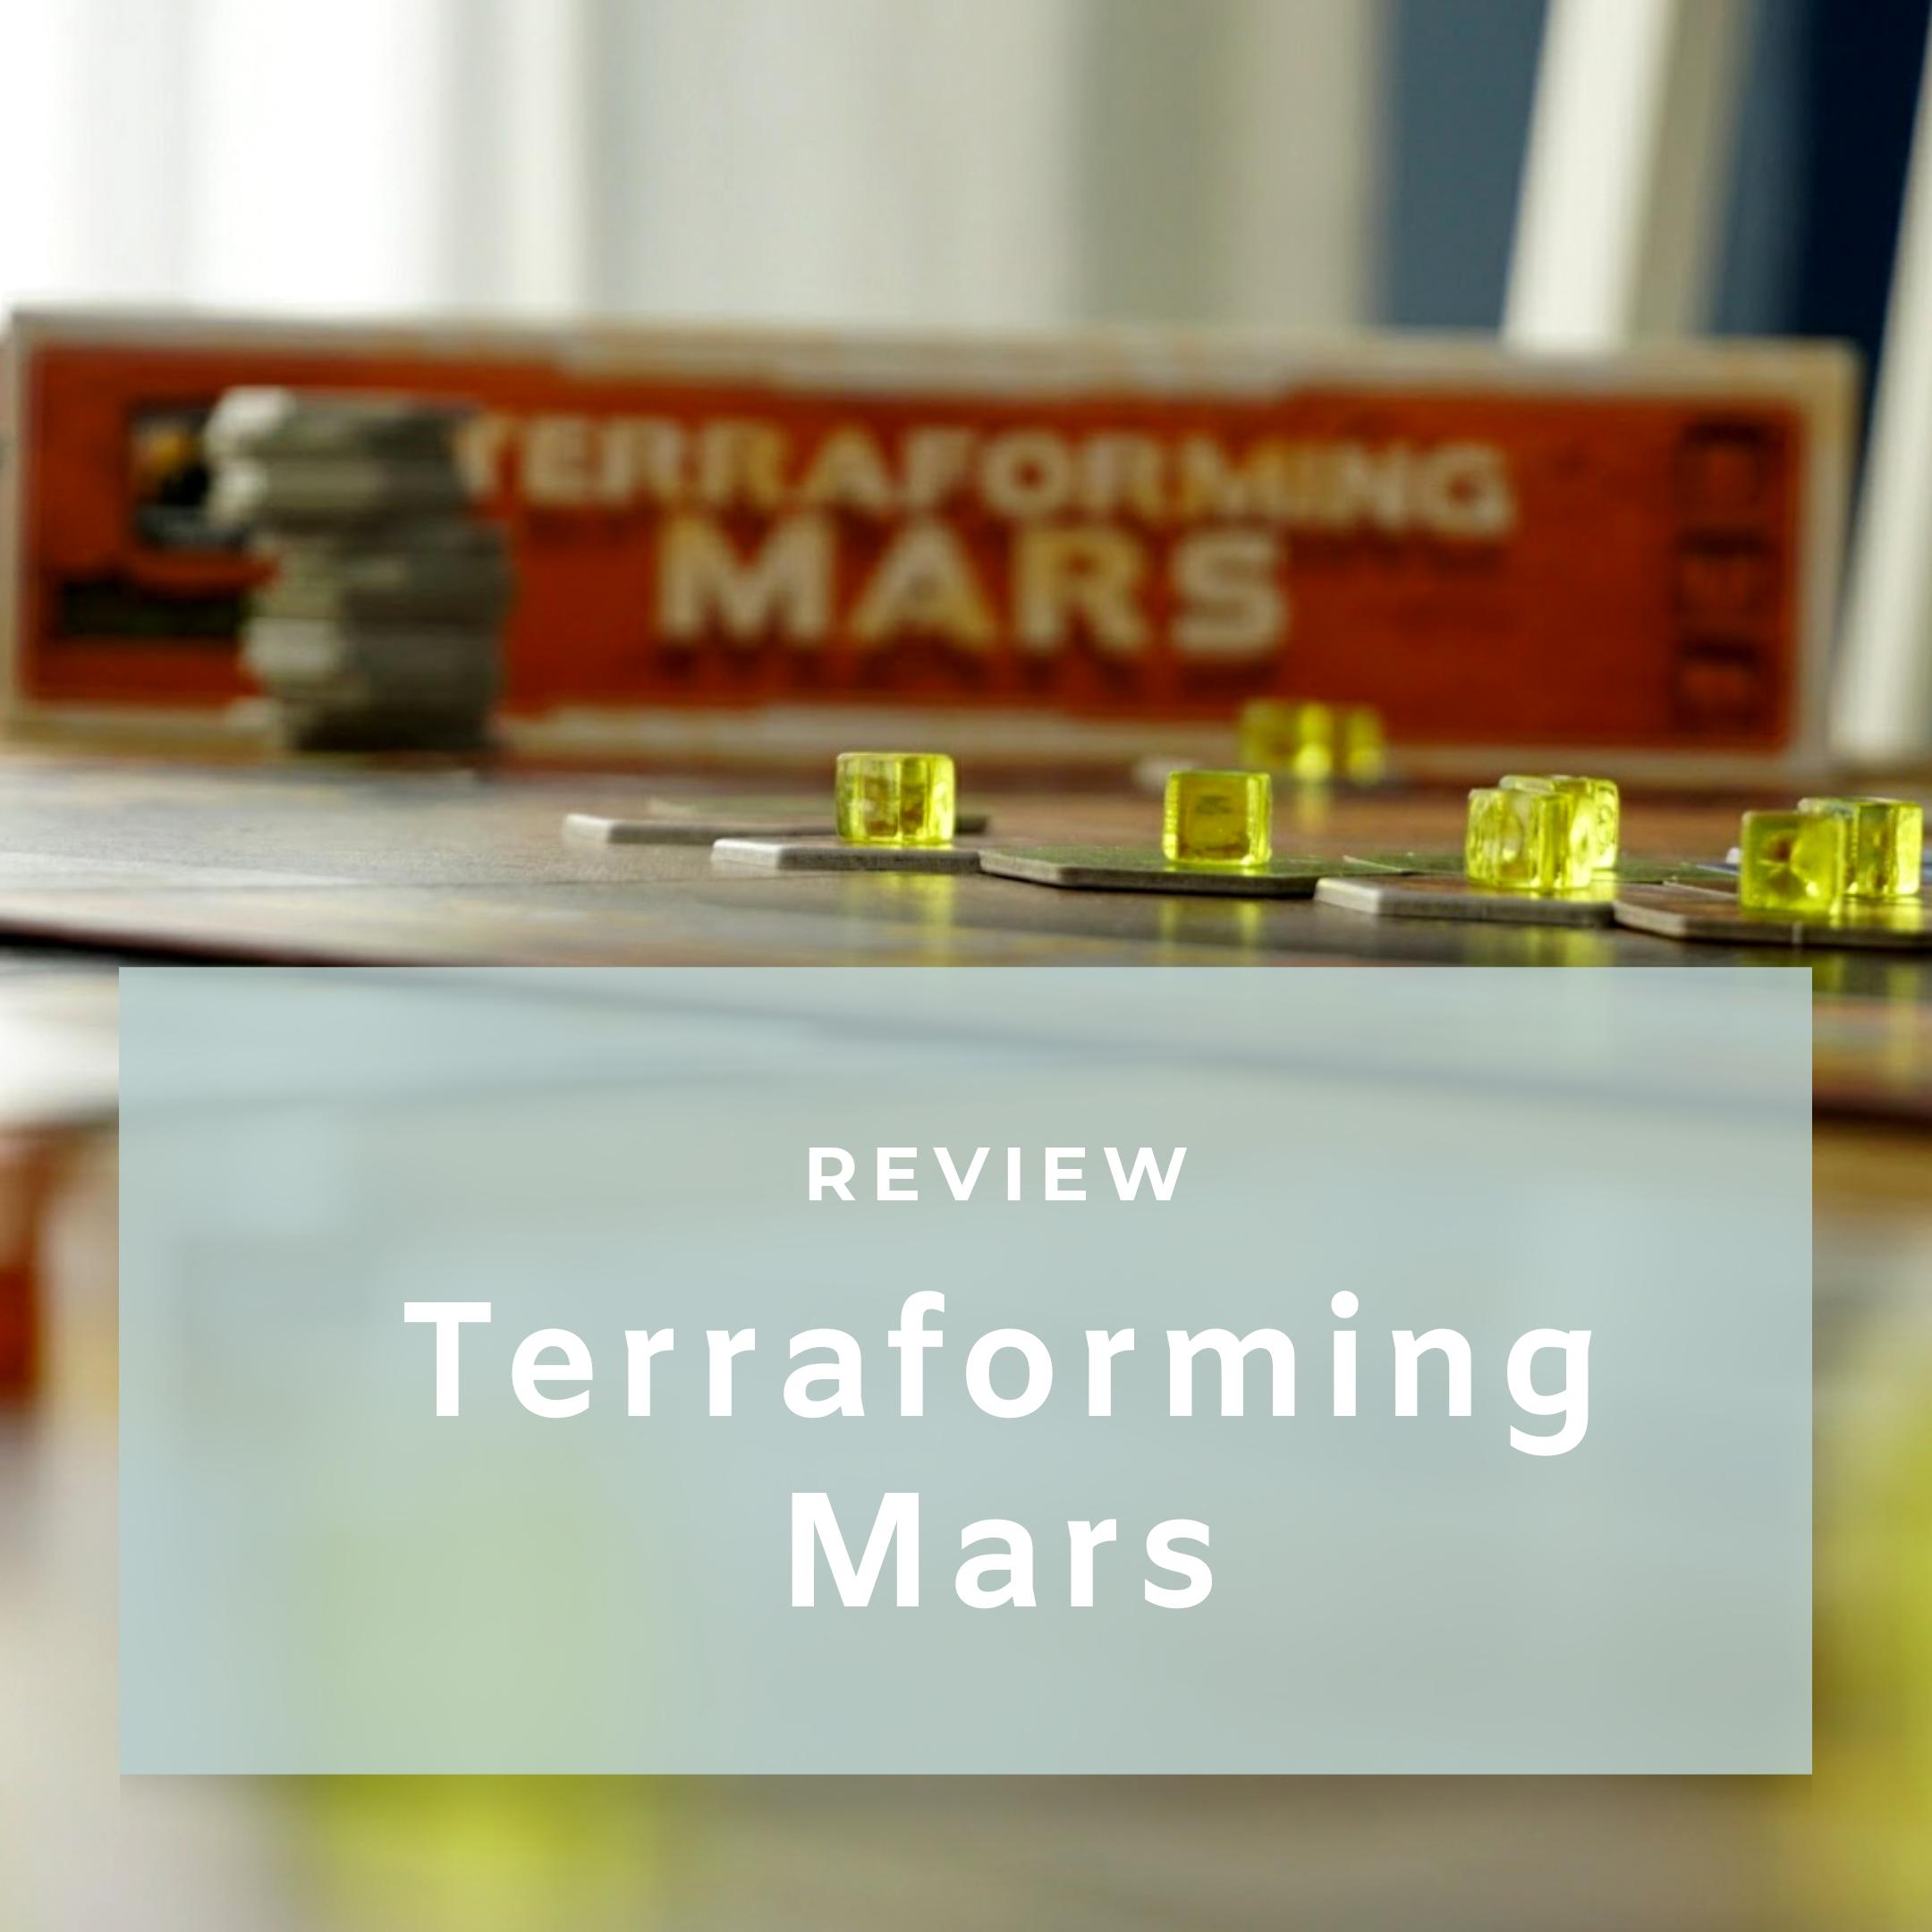 Review Terraforming Mars